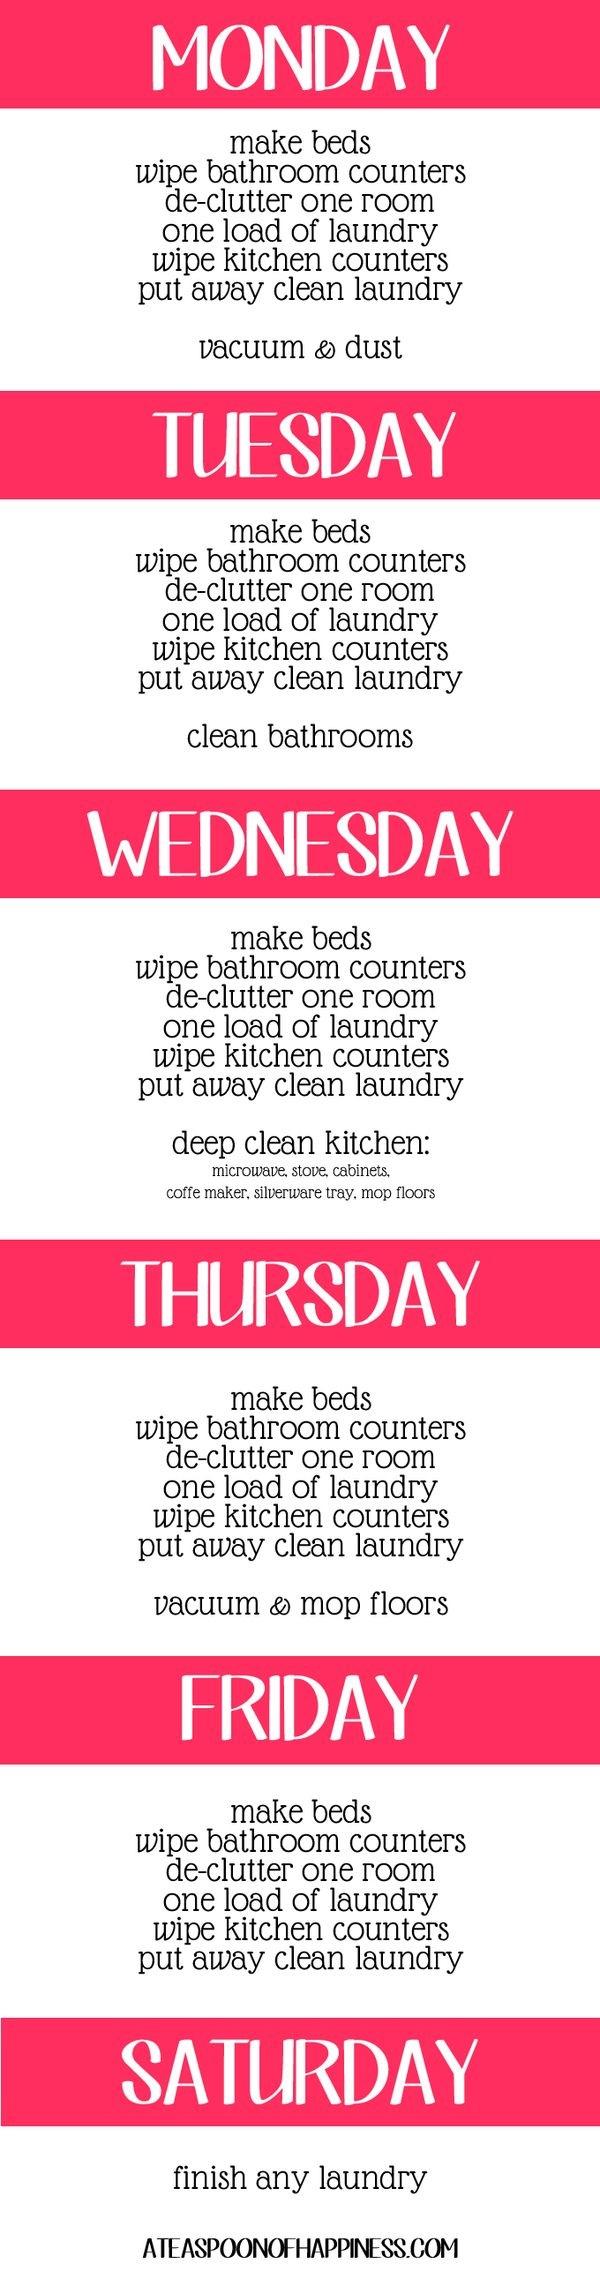 Good schedule